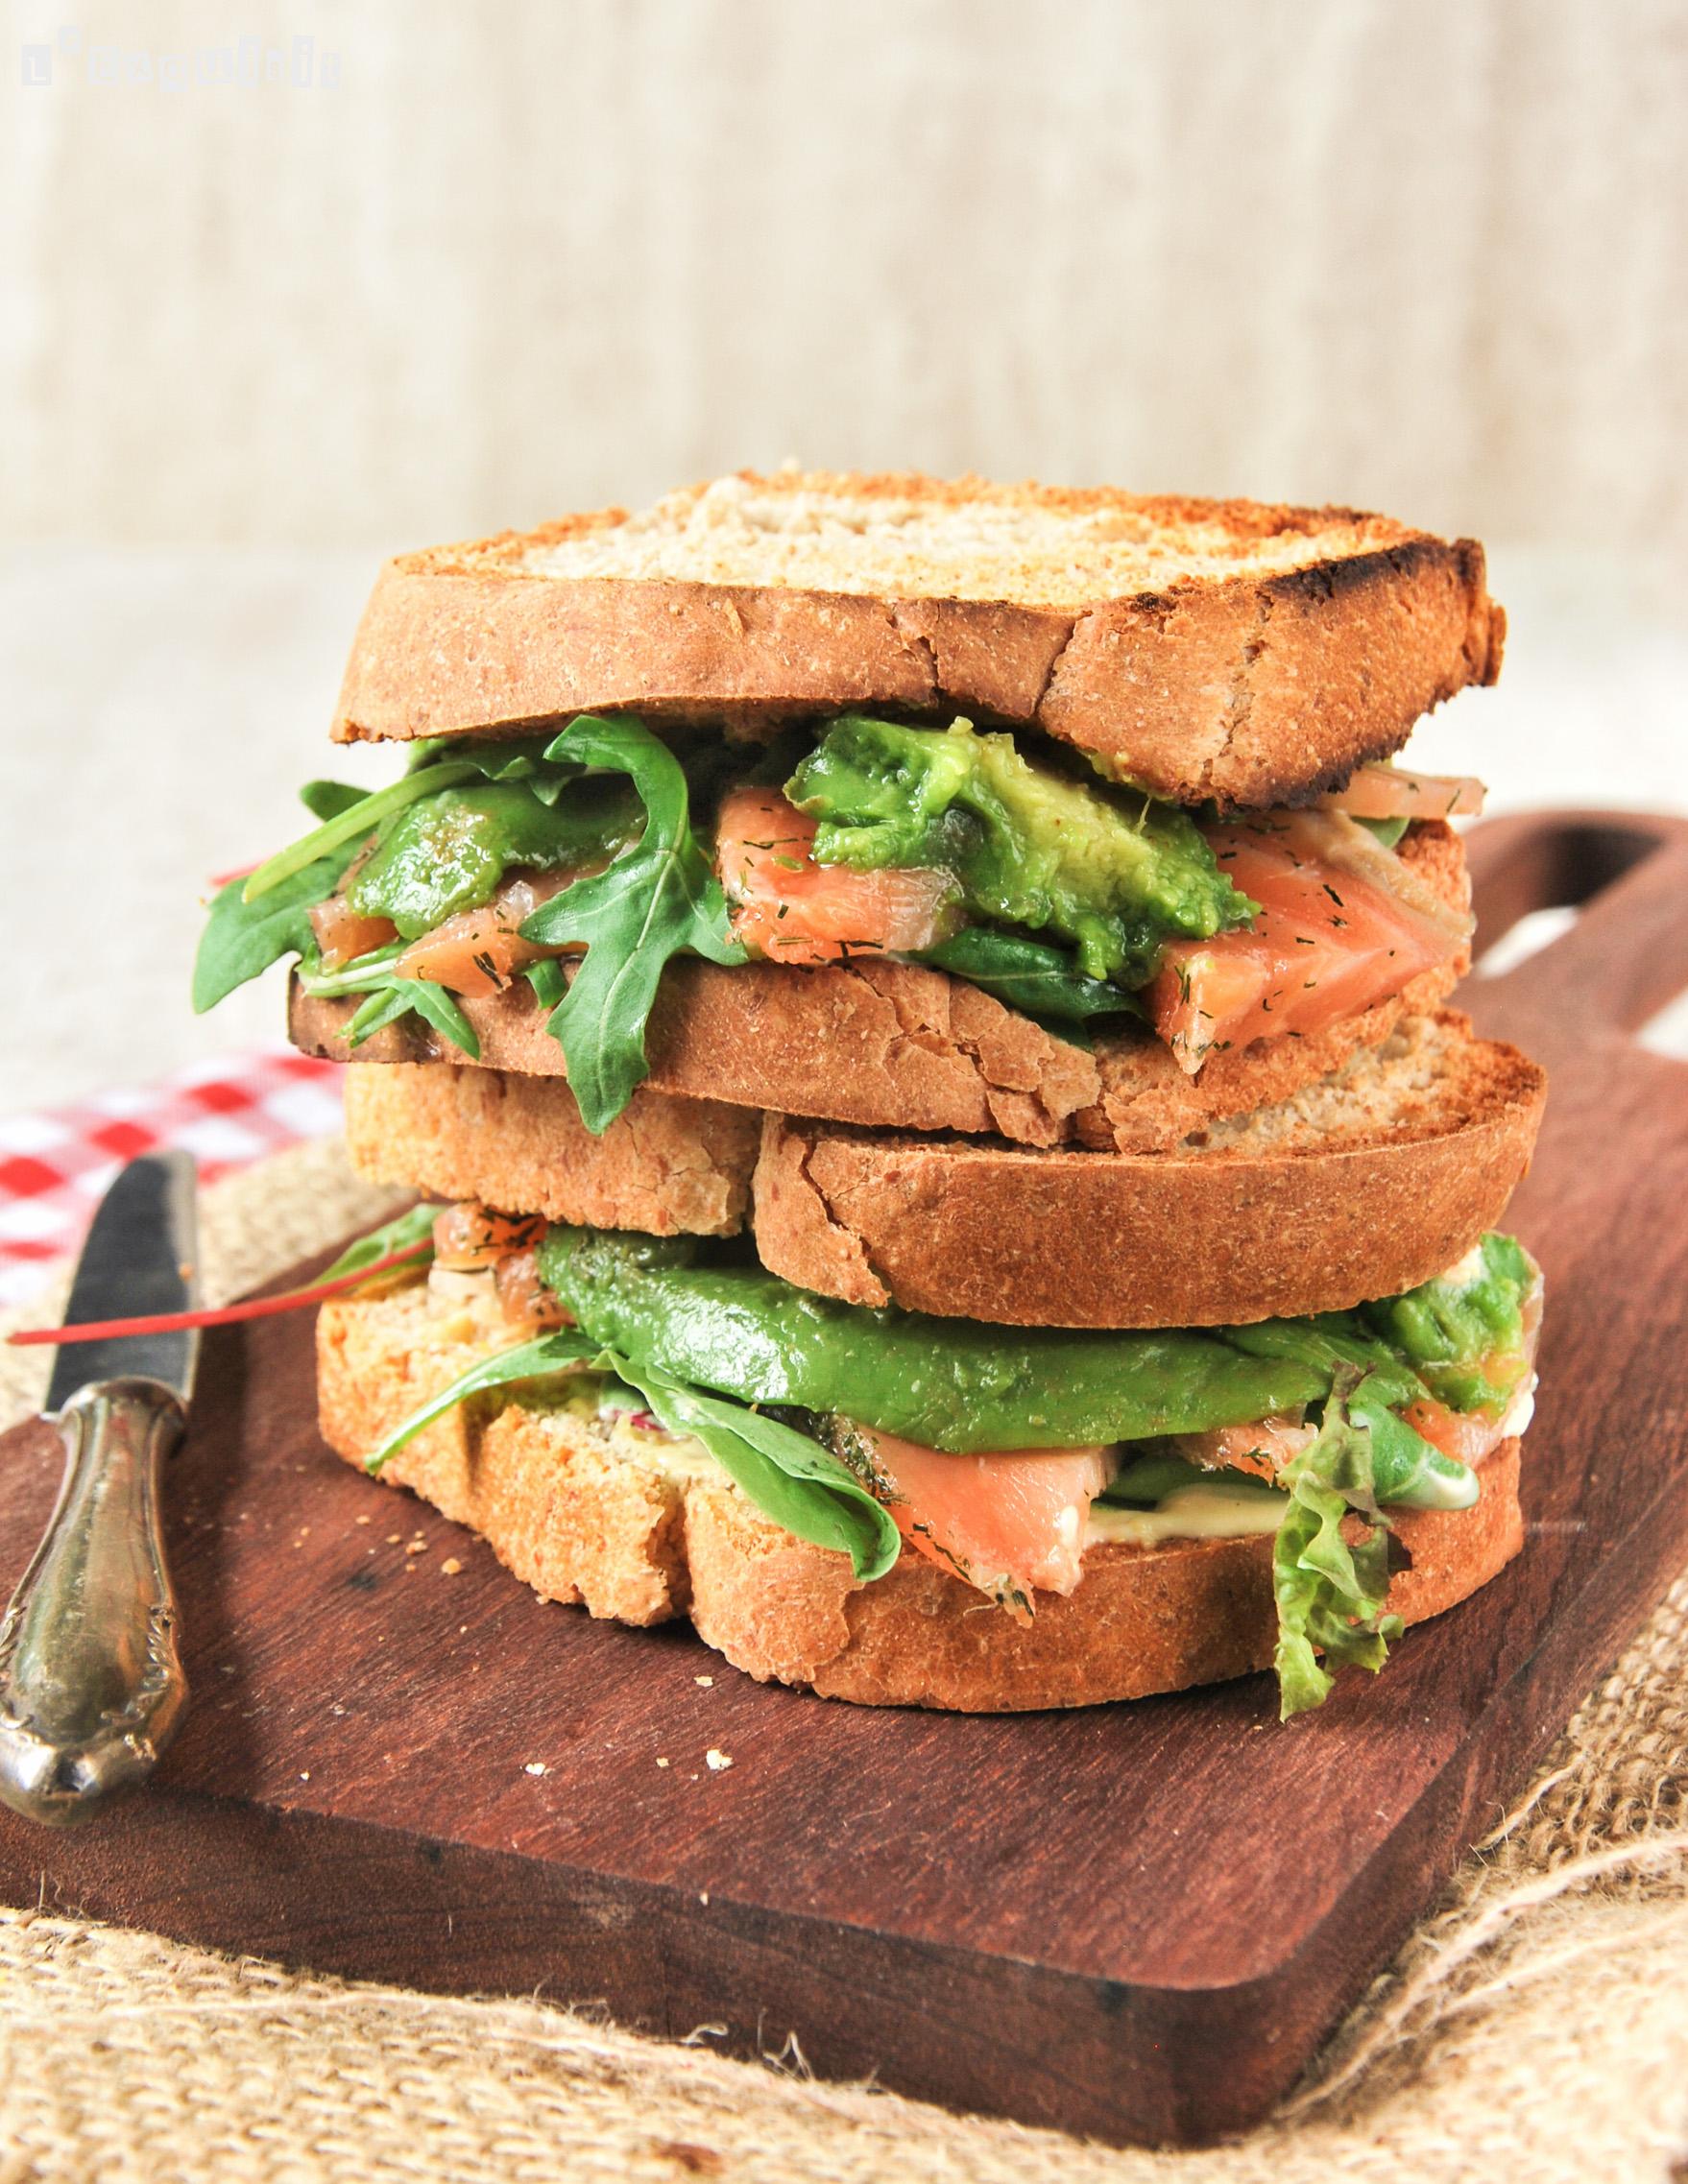 Sandwich de salmón y aguacate